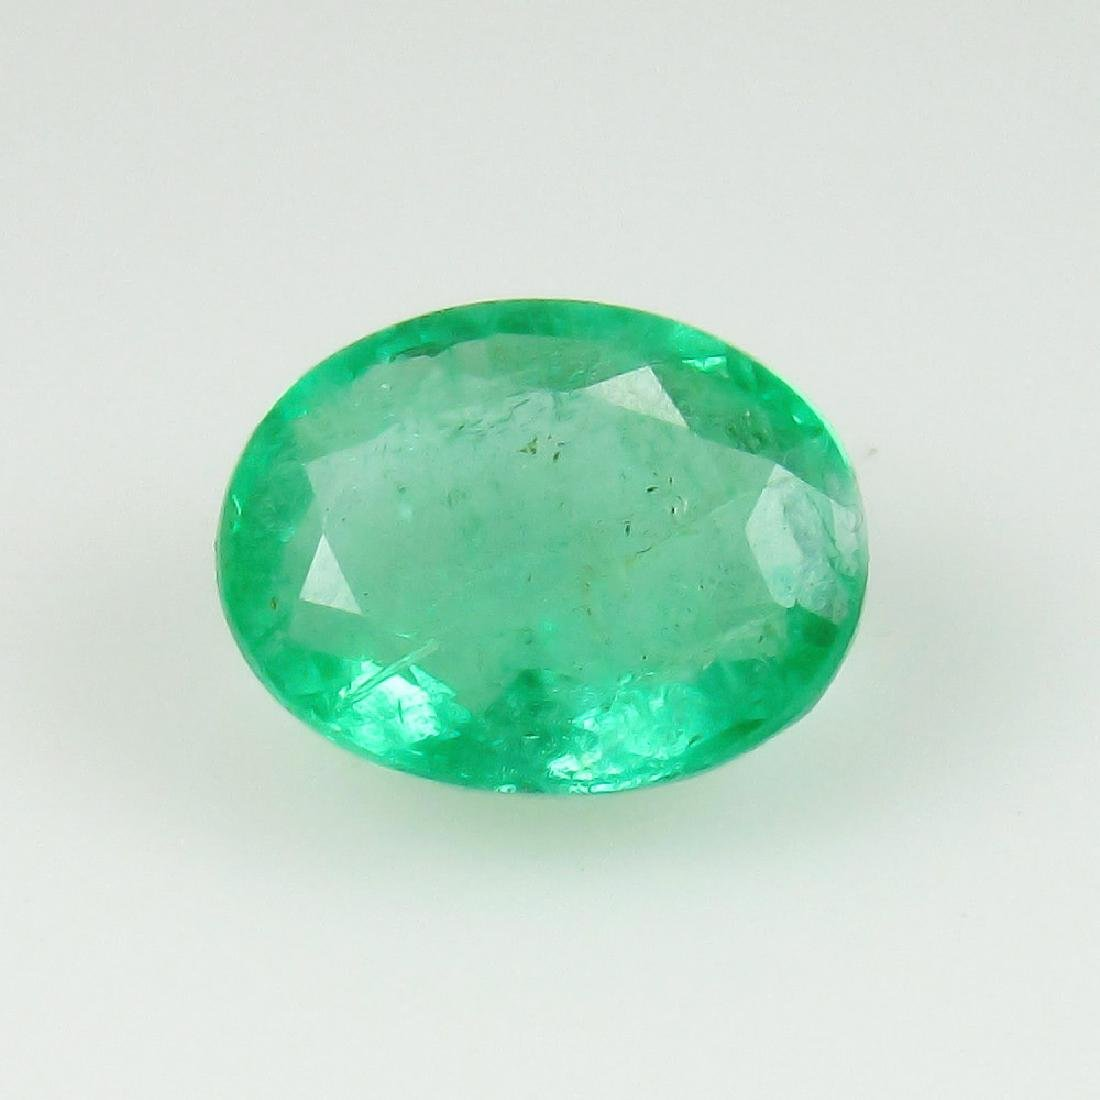 1.35 Ctw Natural Zambian Loose Oval cut Emerald